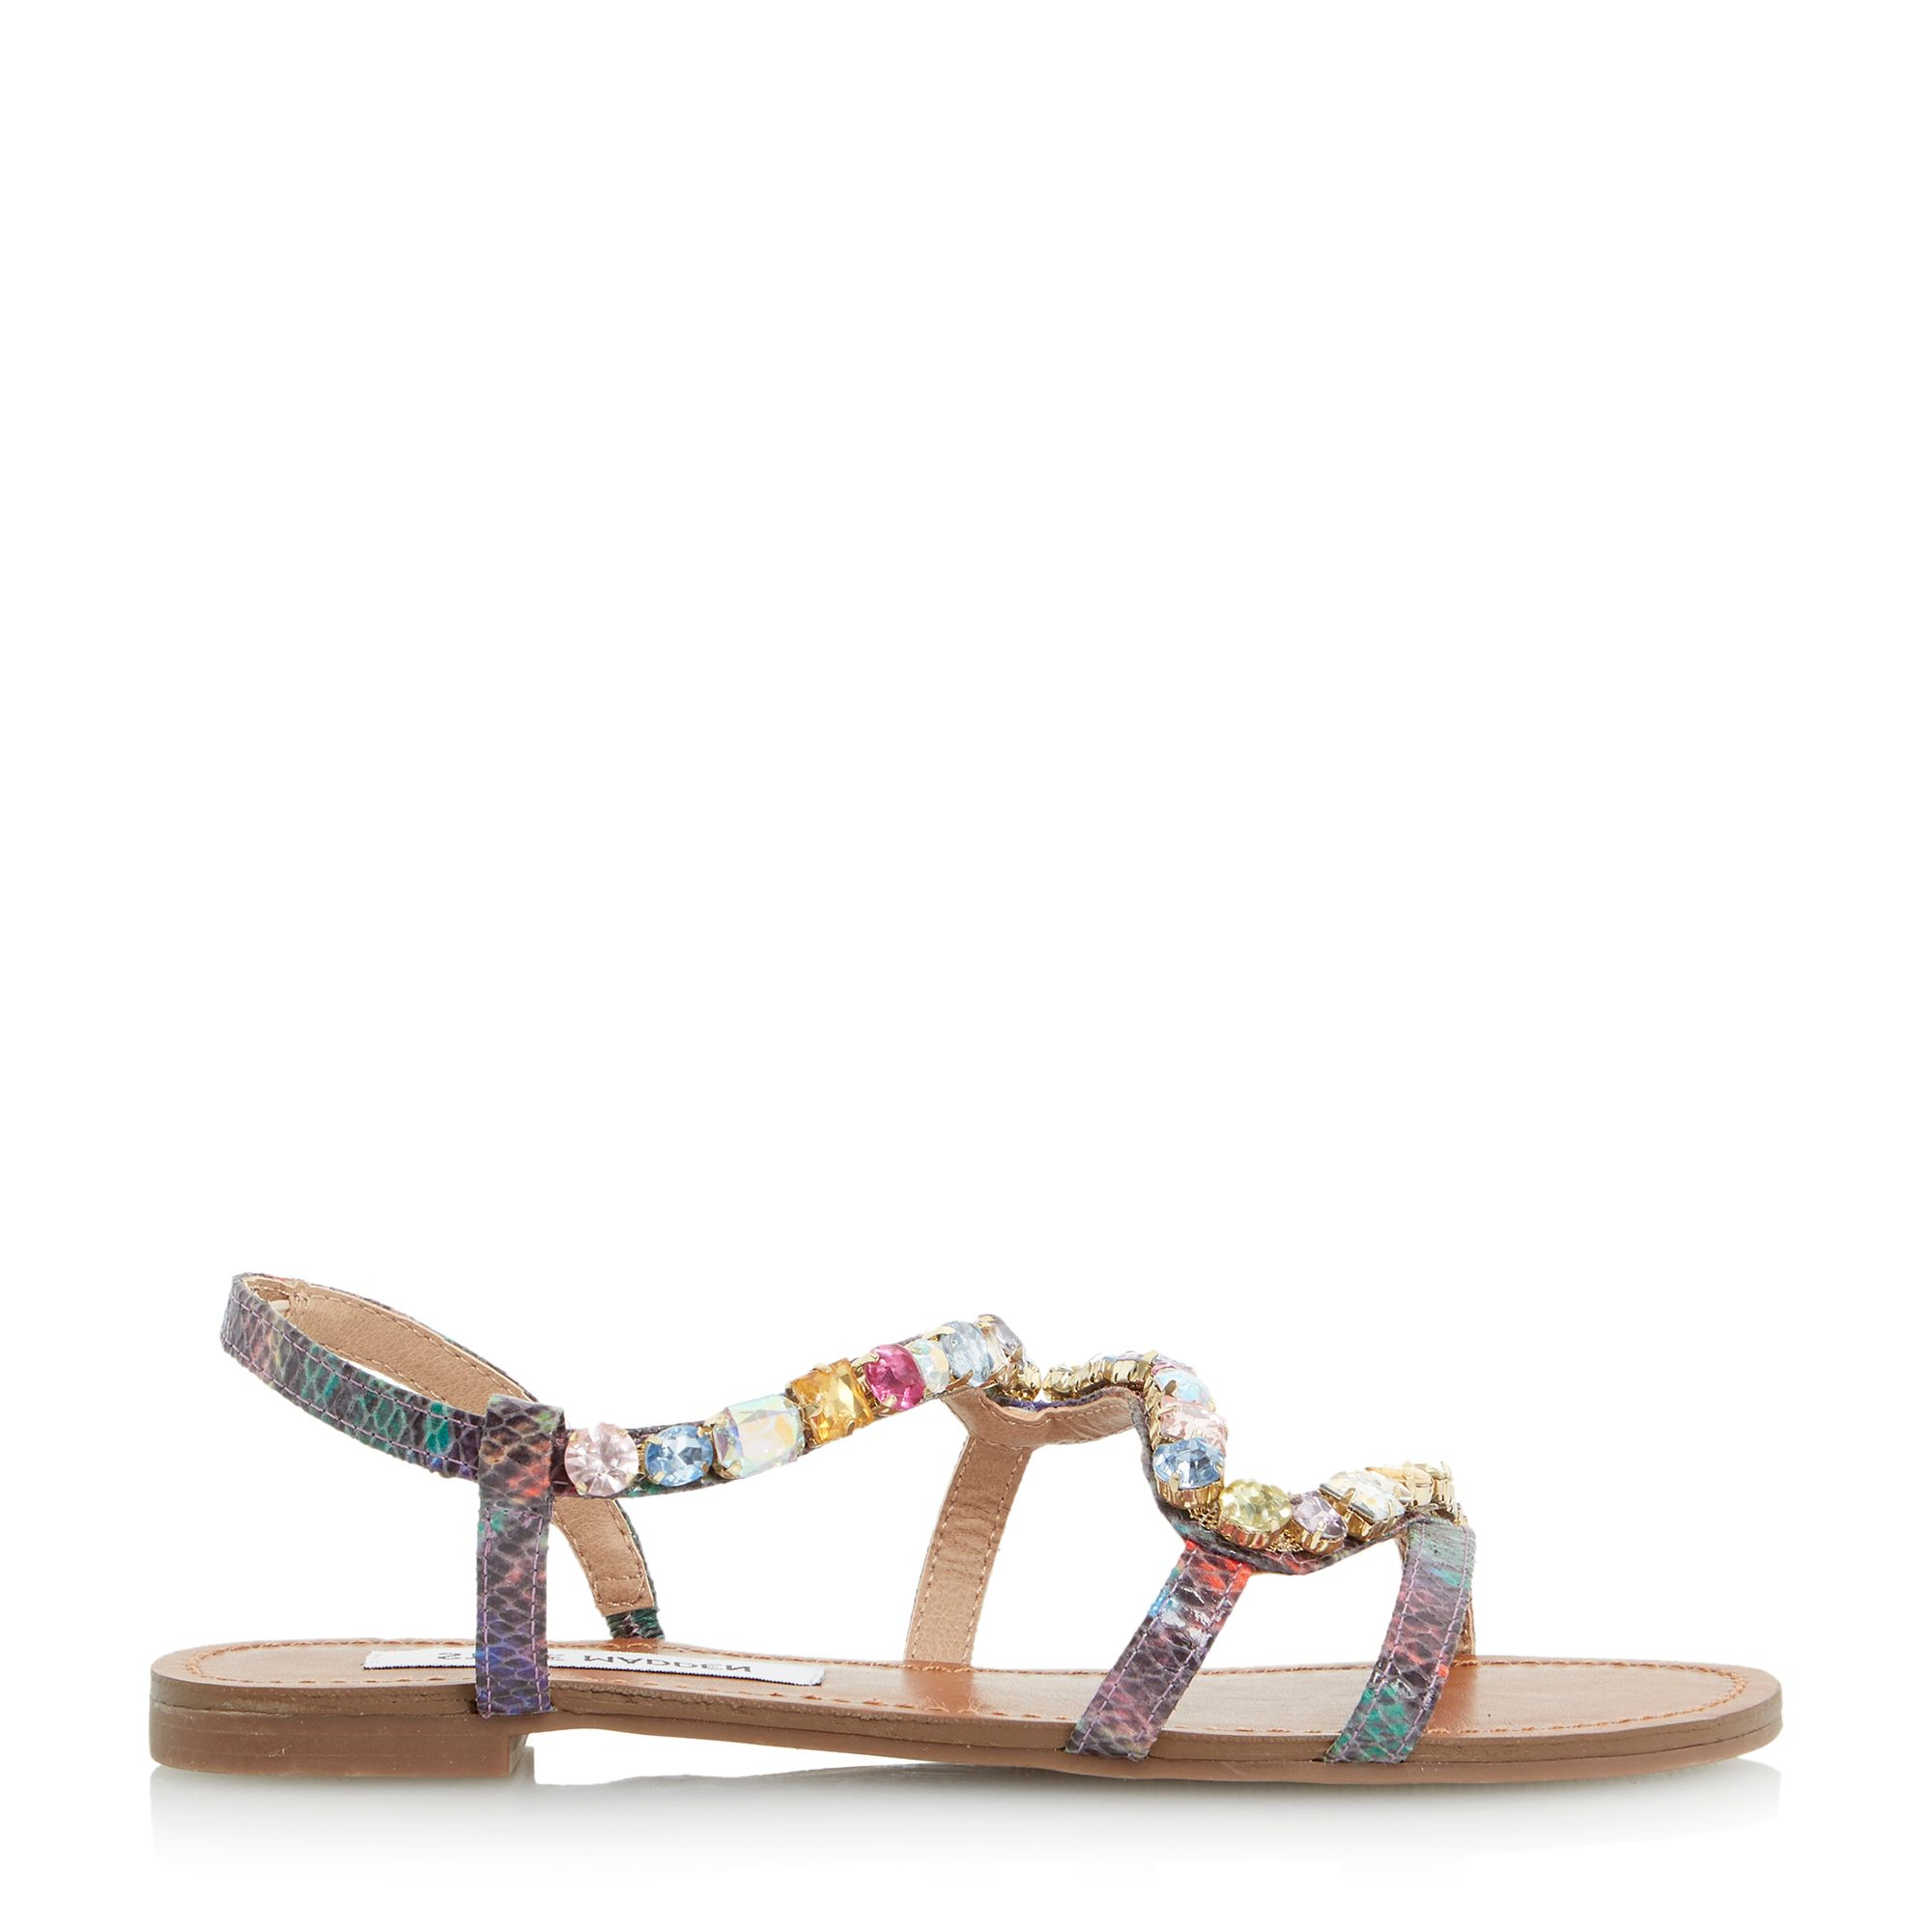 92c43bdc54bfd Jewelled Flat Sandals Australia.Jeweled Flat Blush Thong Sandals ...